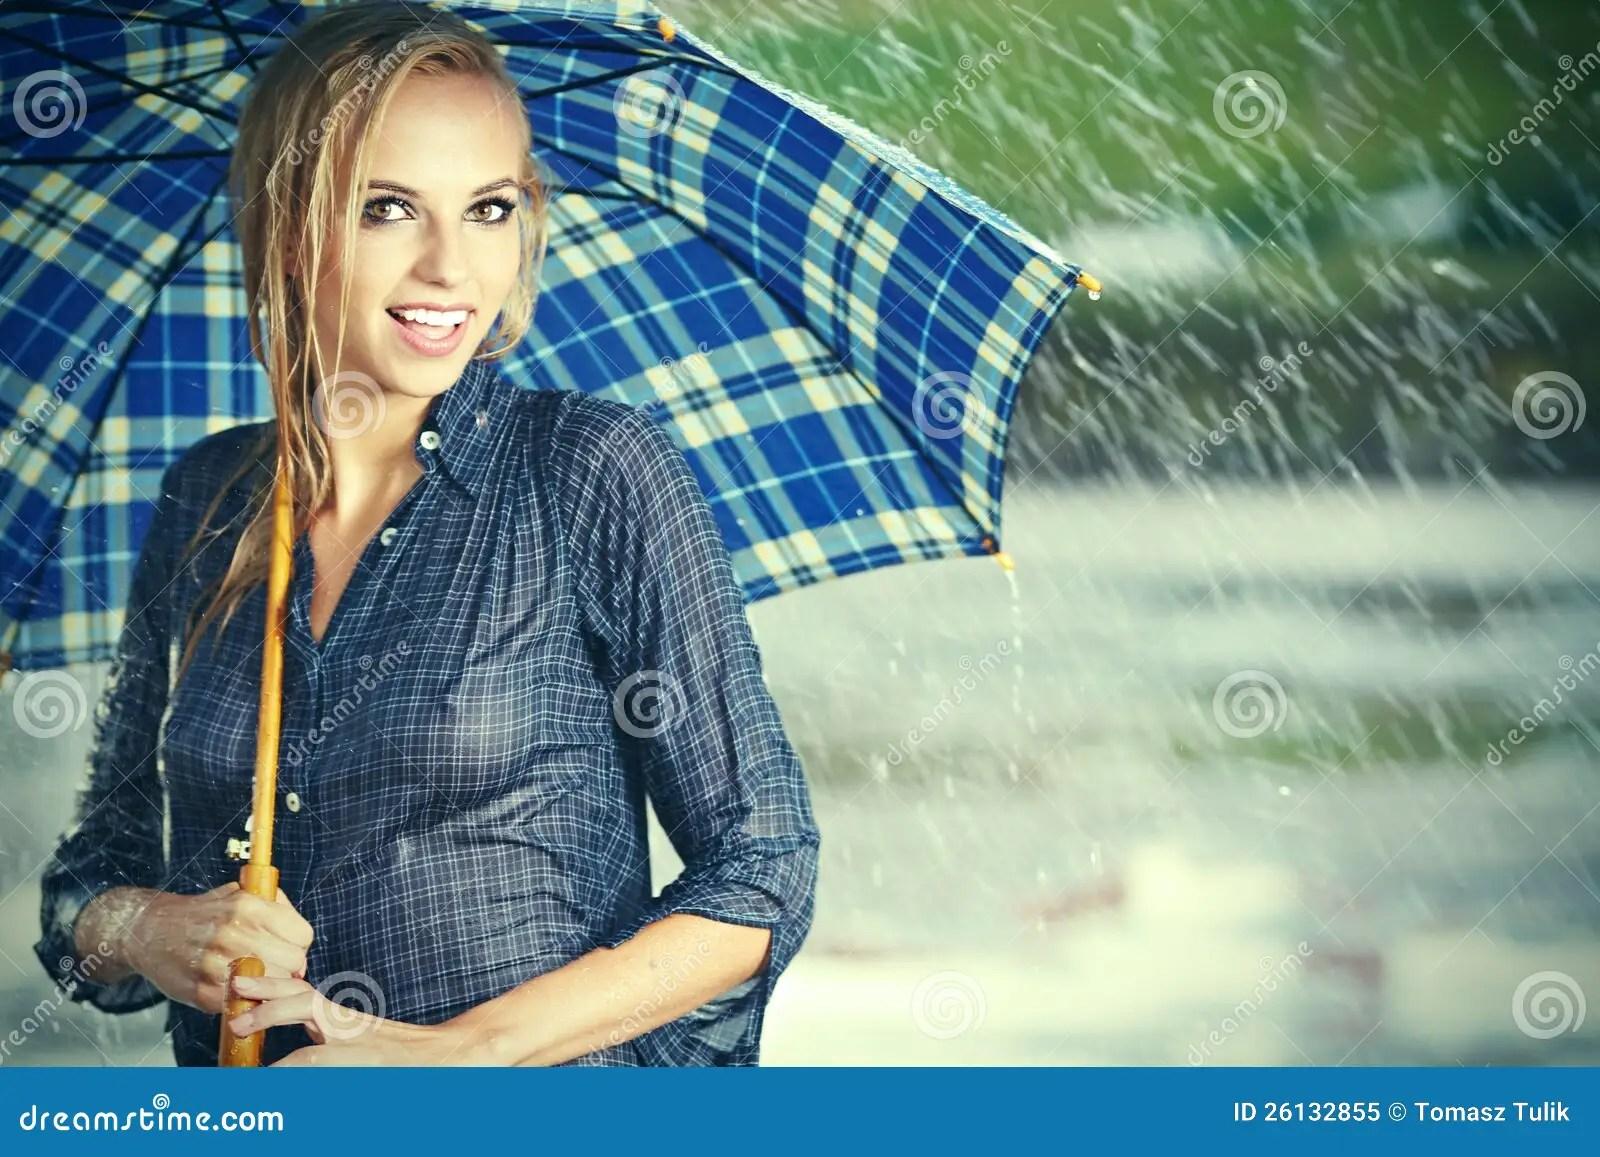 Lonely Girl Walking In Rain Wallpaper Beautiful Girl In Rain Royalty Free Stock Photo Image